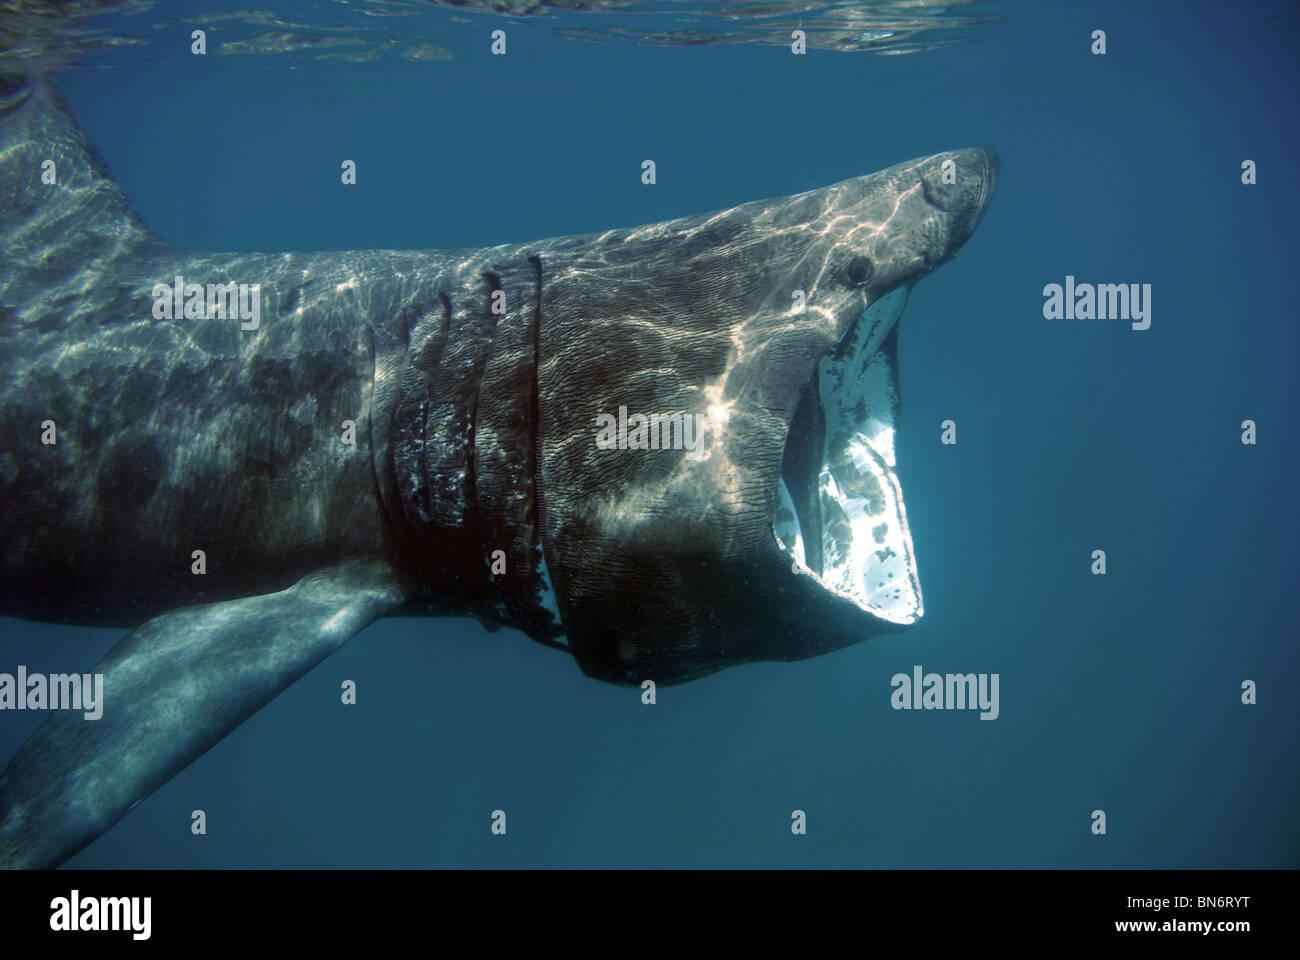 Basking shark gorging on Plankton at Sennen Cove, England - Stock Image